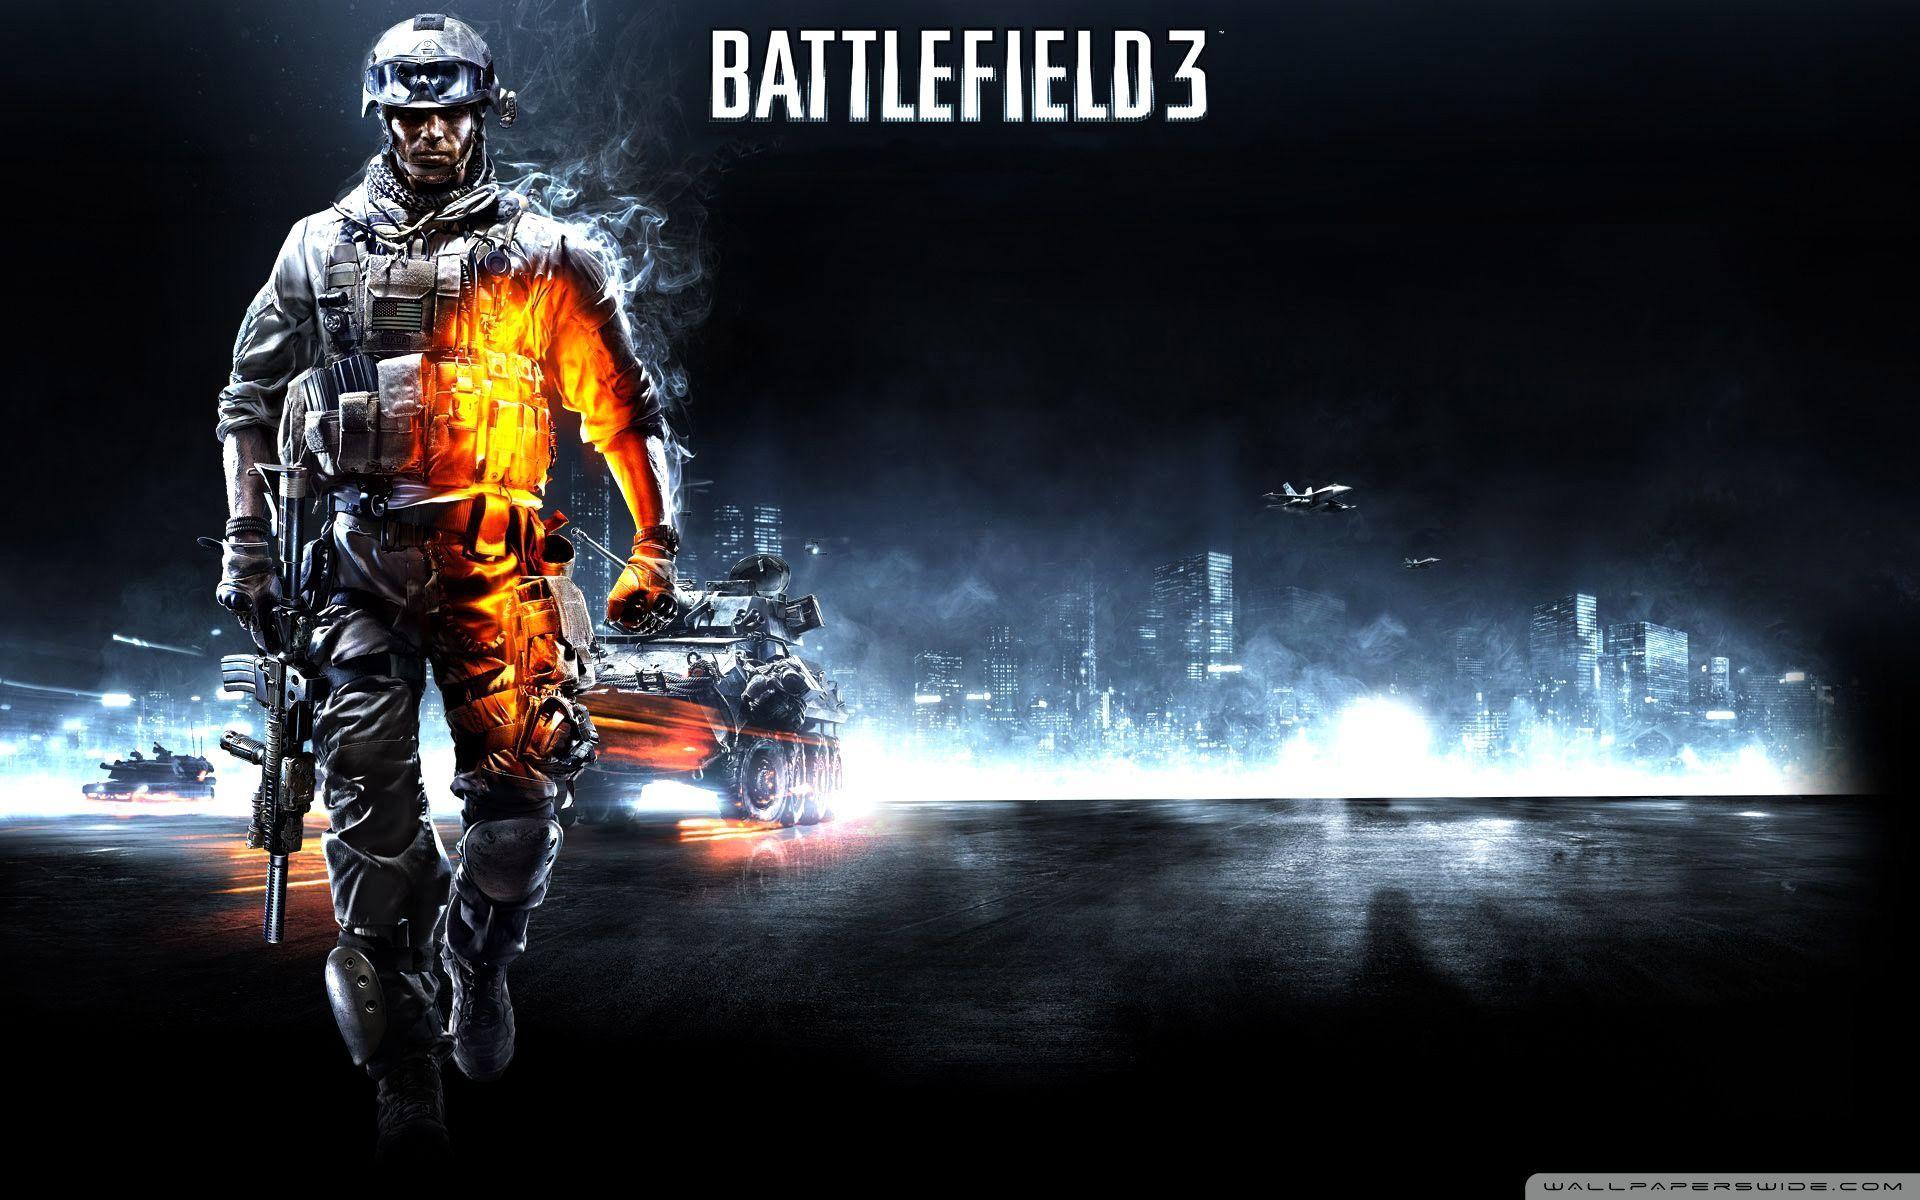 Battlefield 3 Wallpapers Top Free Battlefield 3 Backgrounds Wallpaperaccess